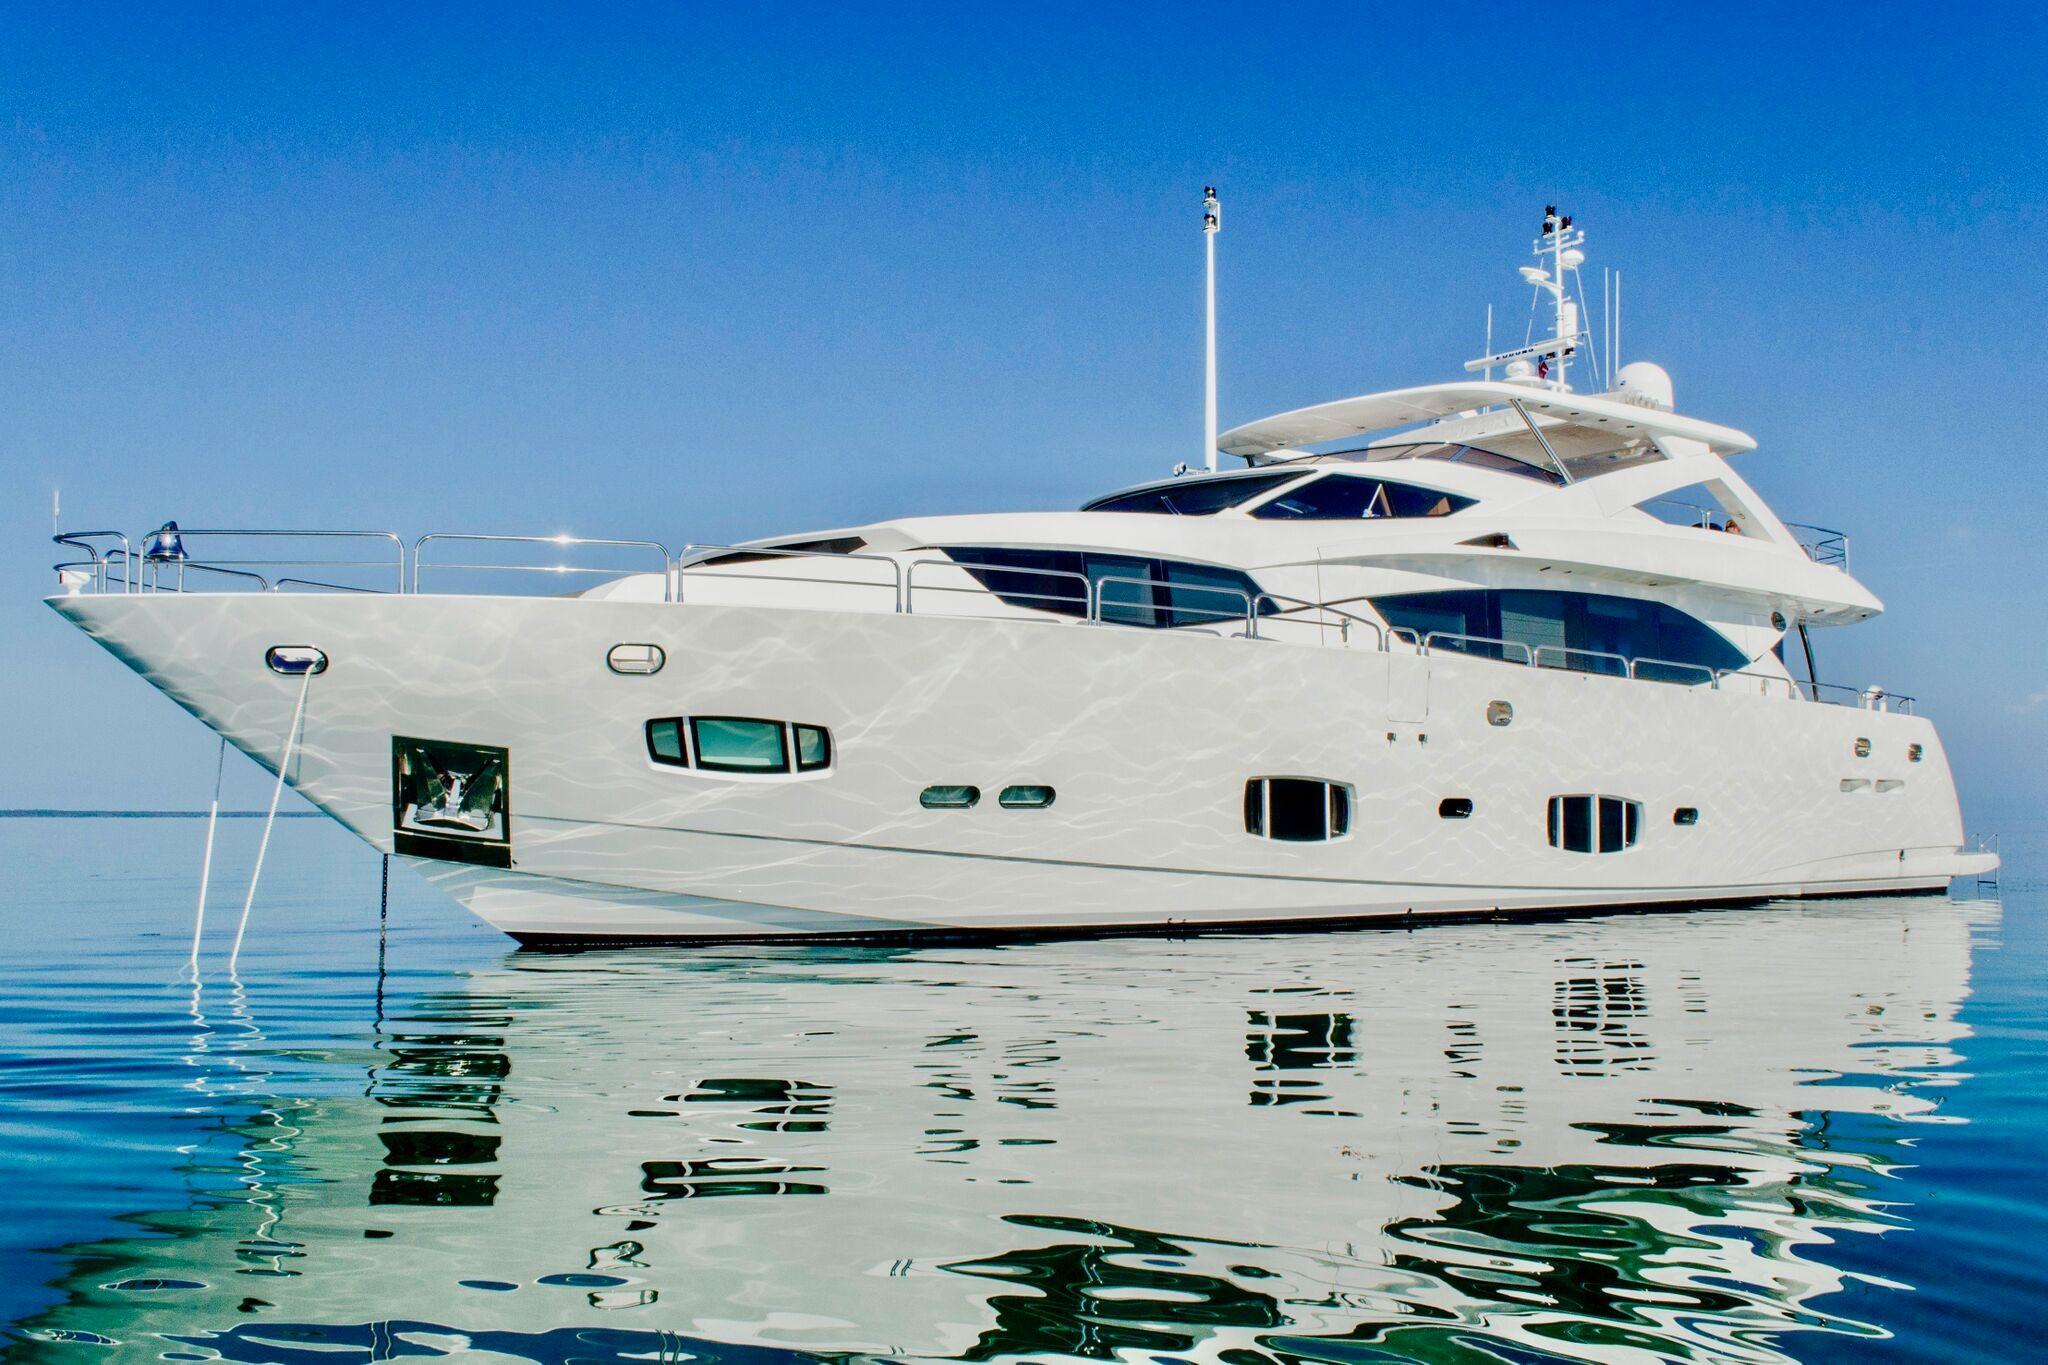 98 ft Sunseeker 30 Metre Yacht